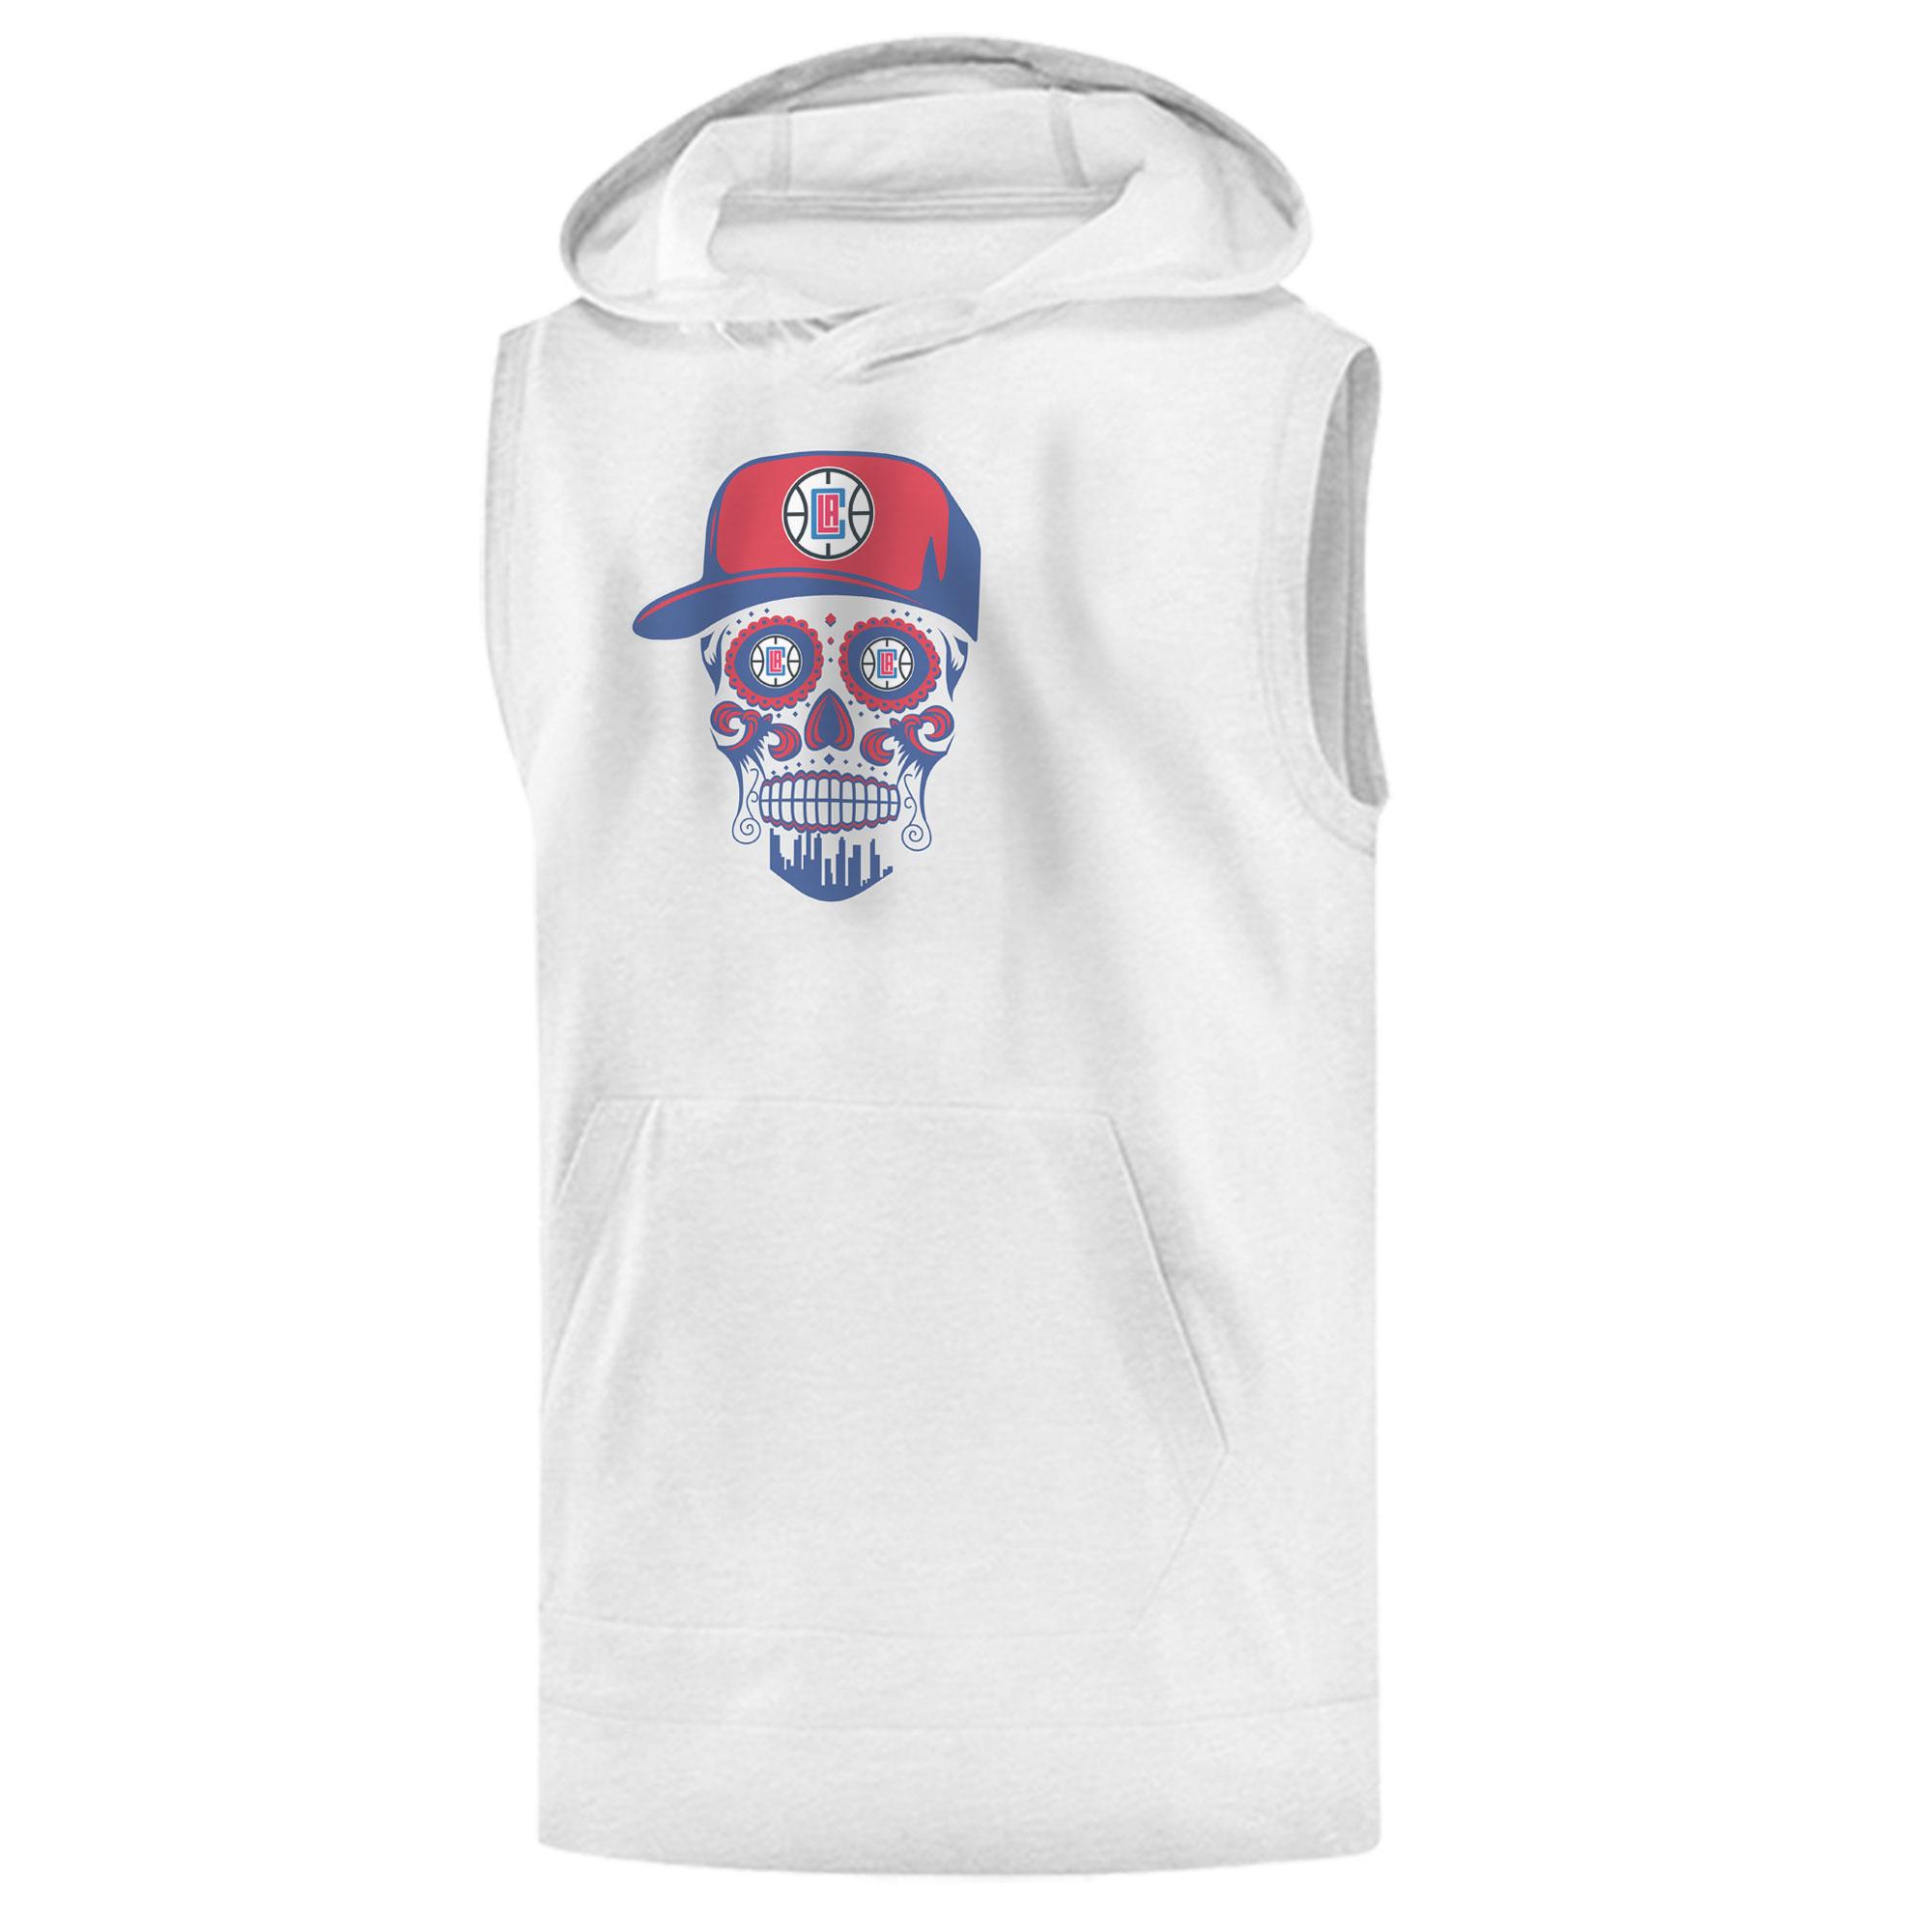 Clippers Skull Sleeveless (KLS-GRY-NP-450-CLIPPERS-SKULL)